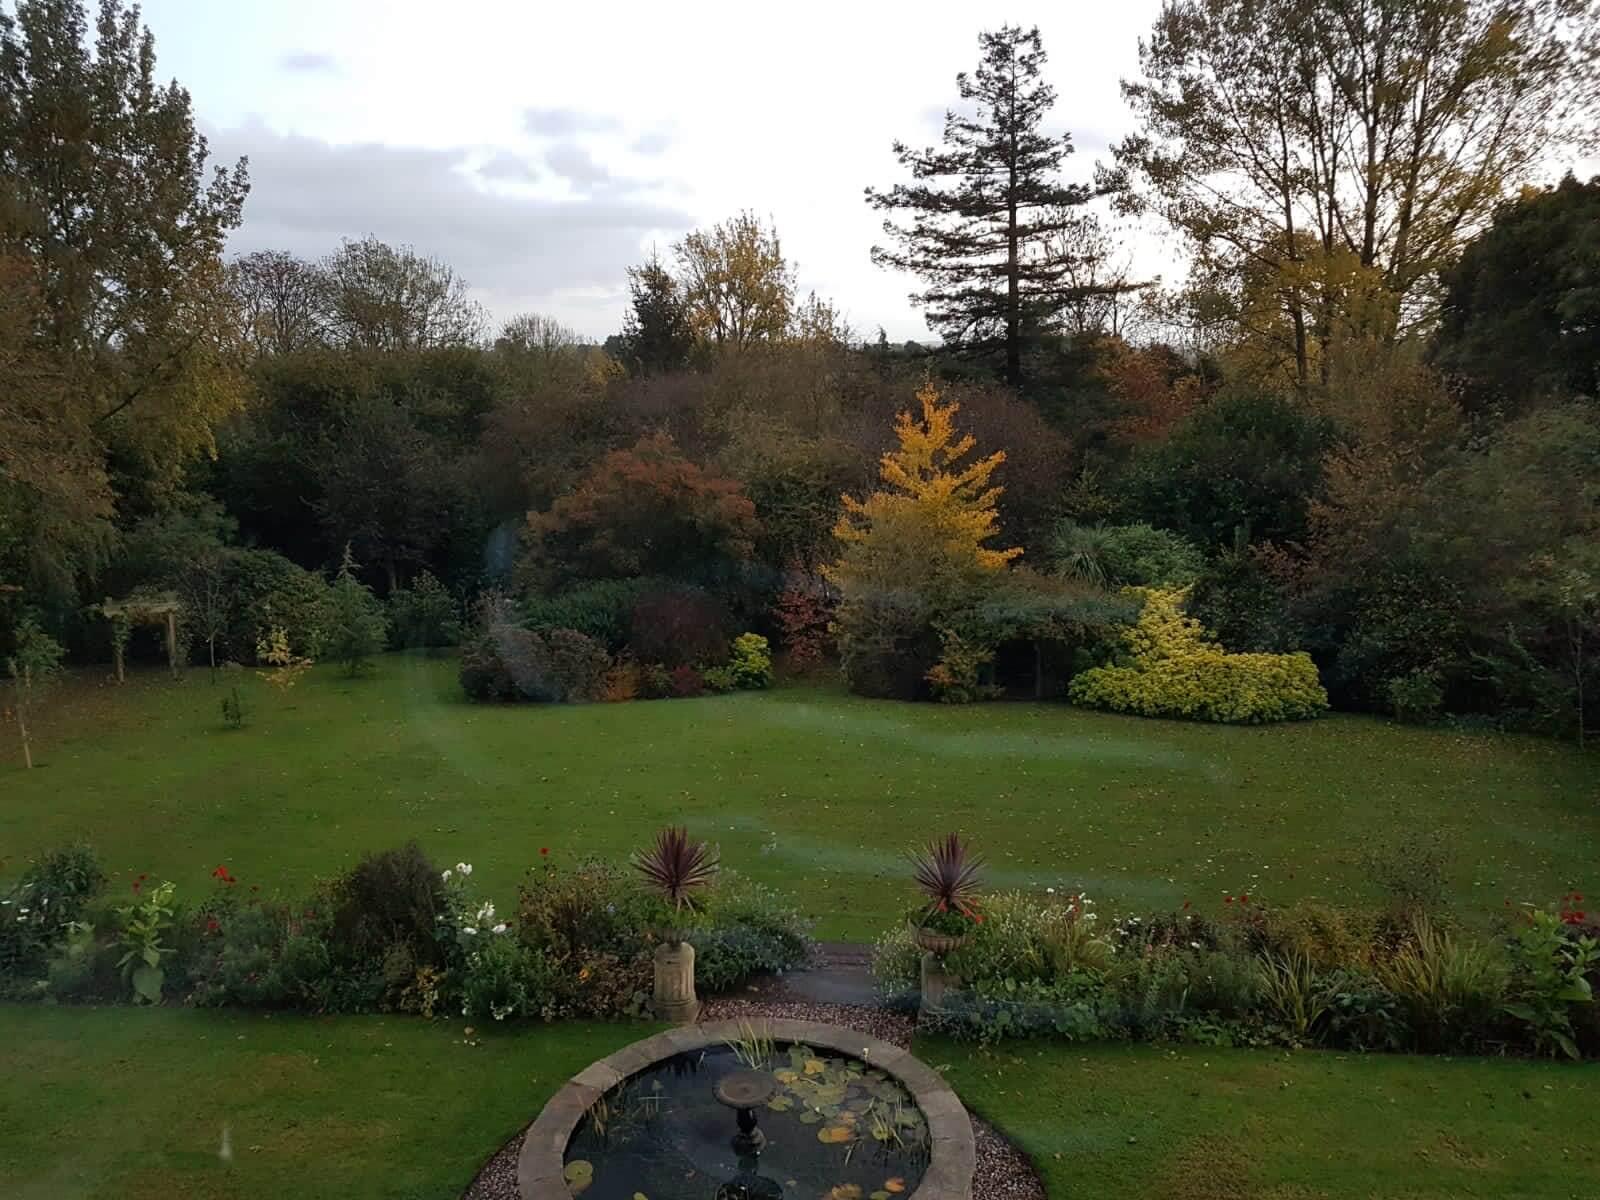 Plymtree Open Gardens